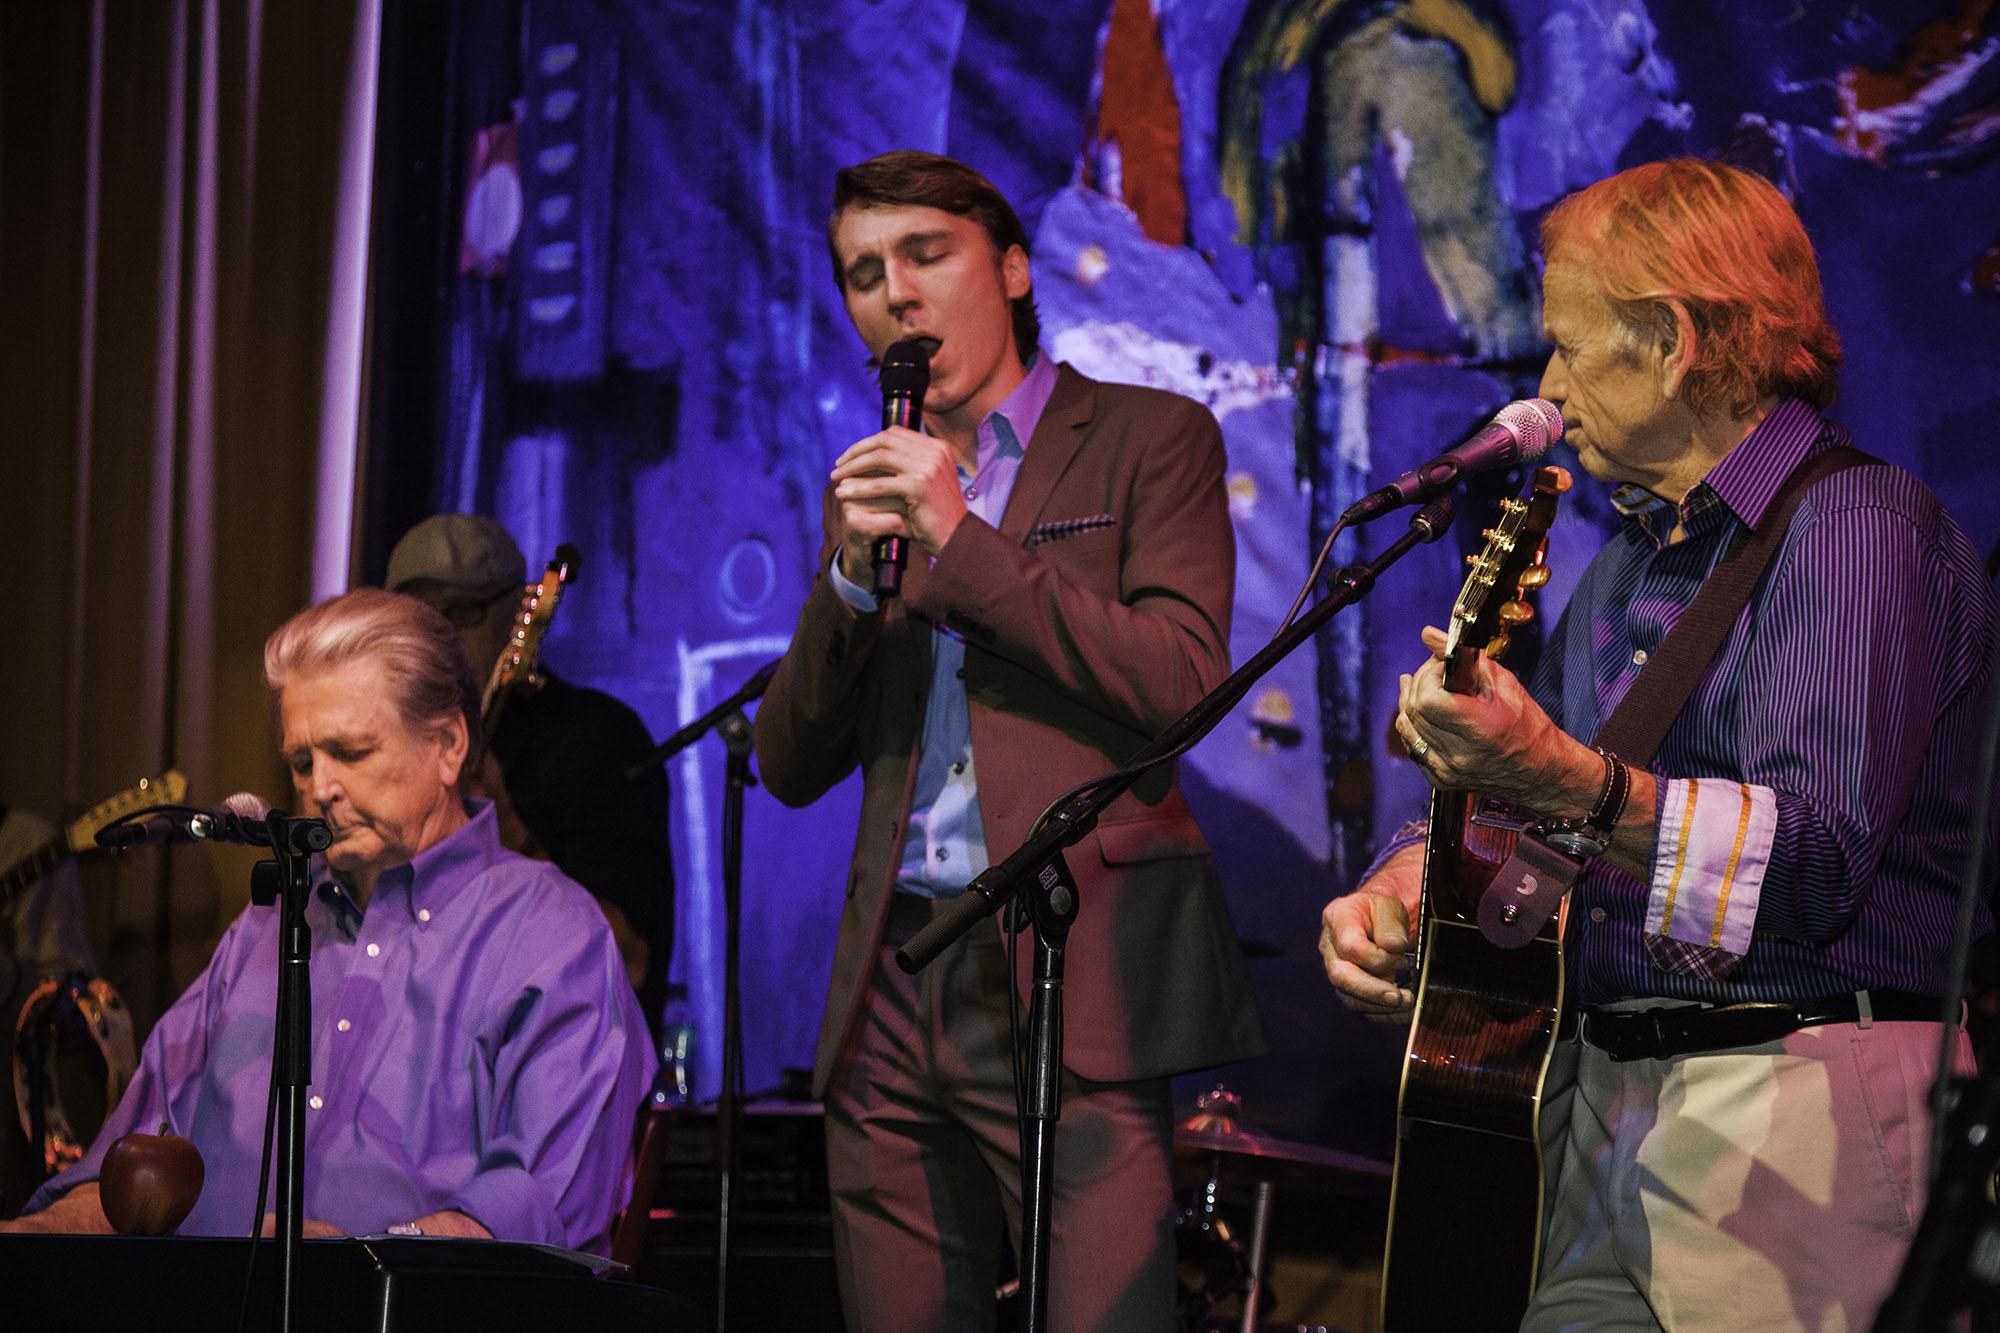 Brian Wilson, Paul Dano Play Beach Boys Hits at 'Love & Mercy' DVD Launch